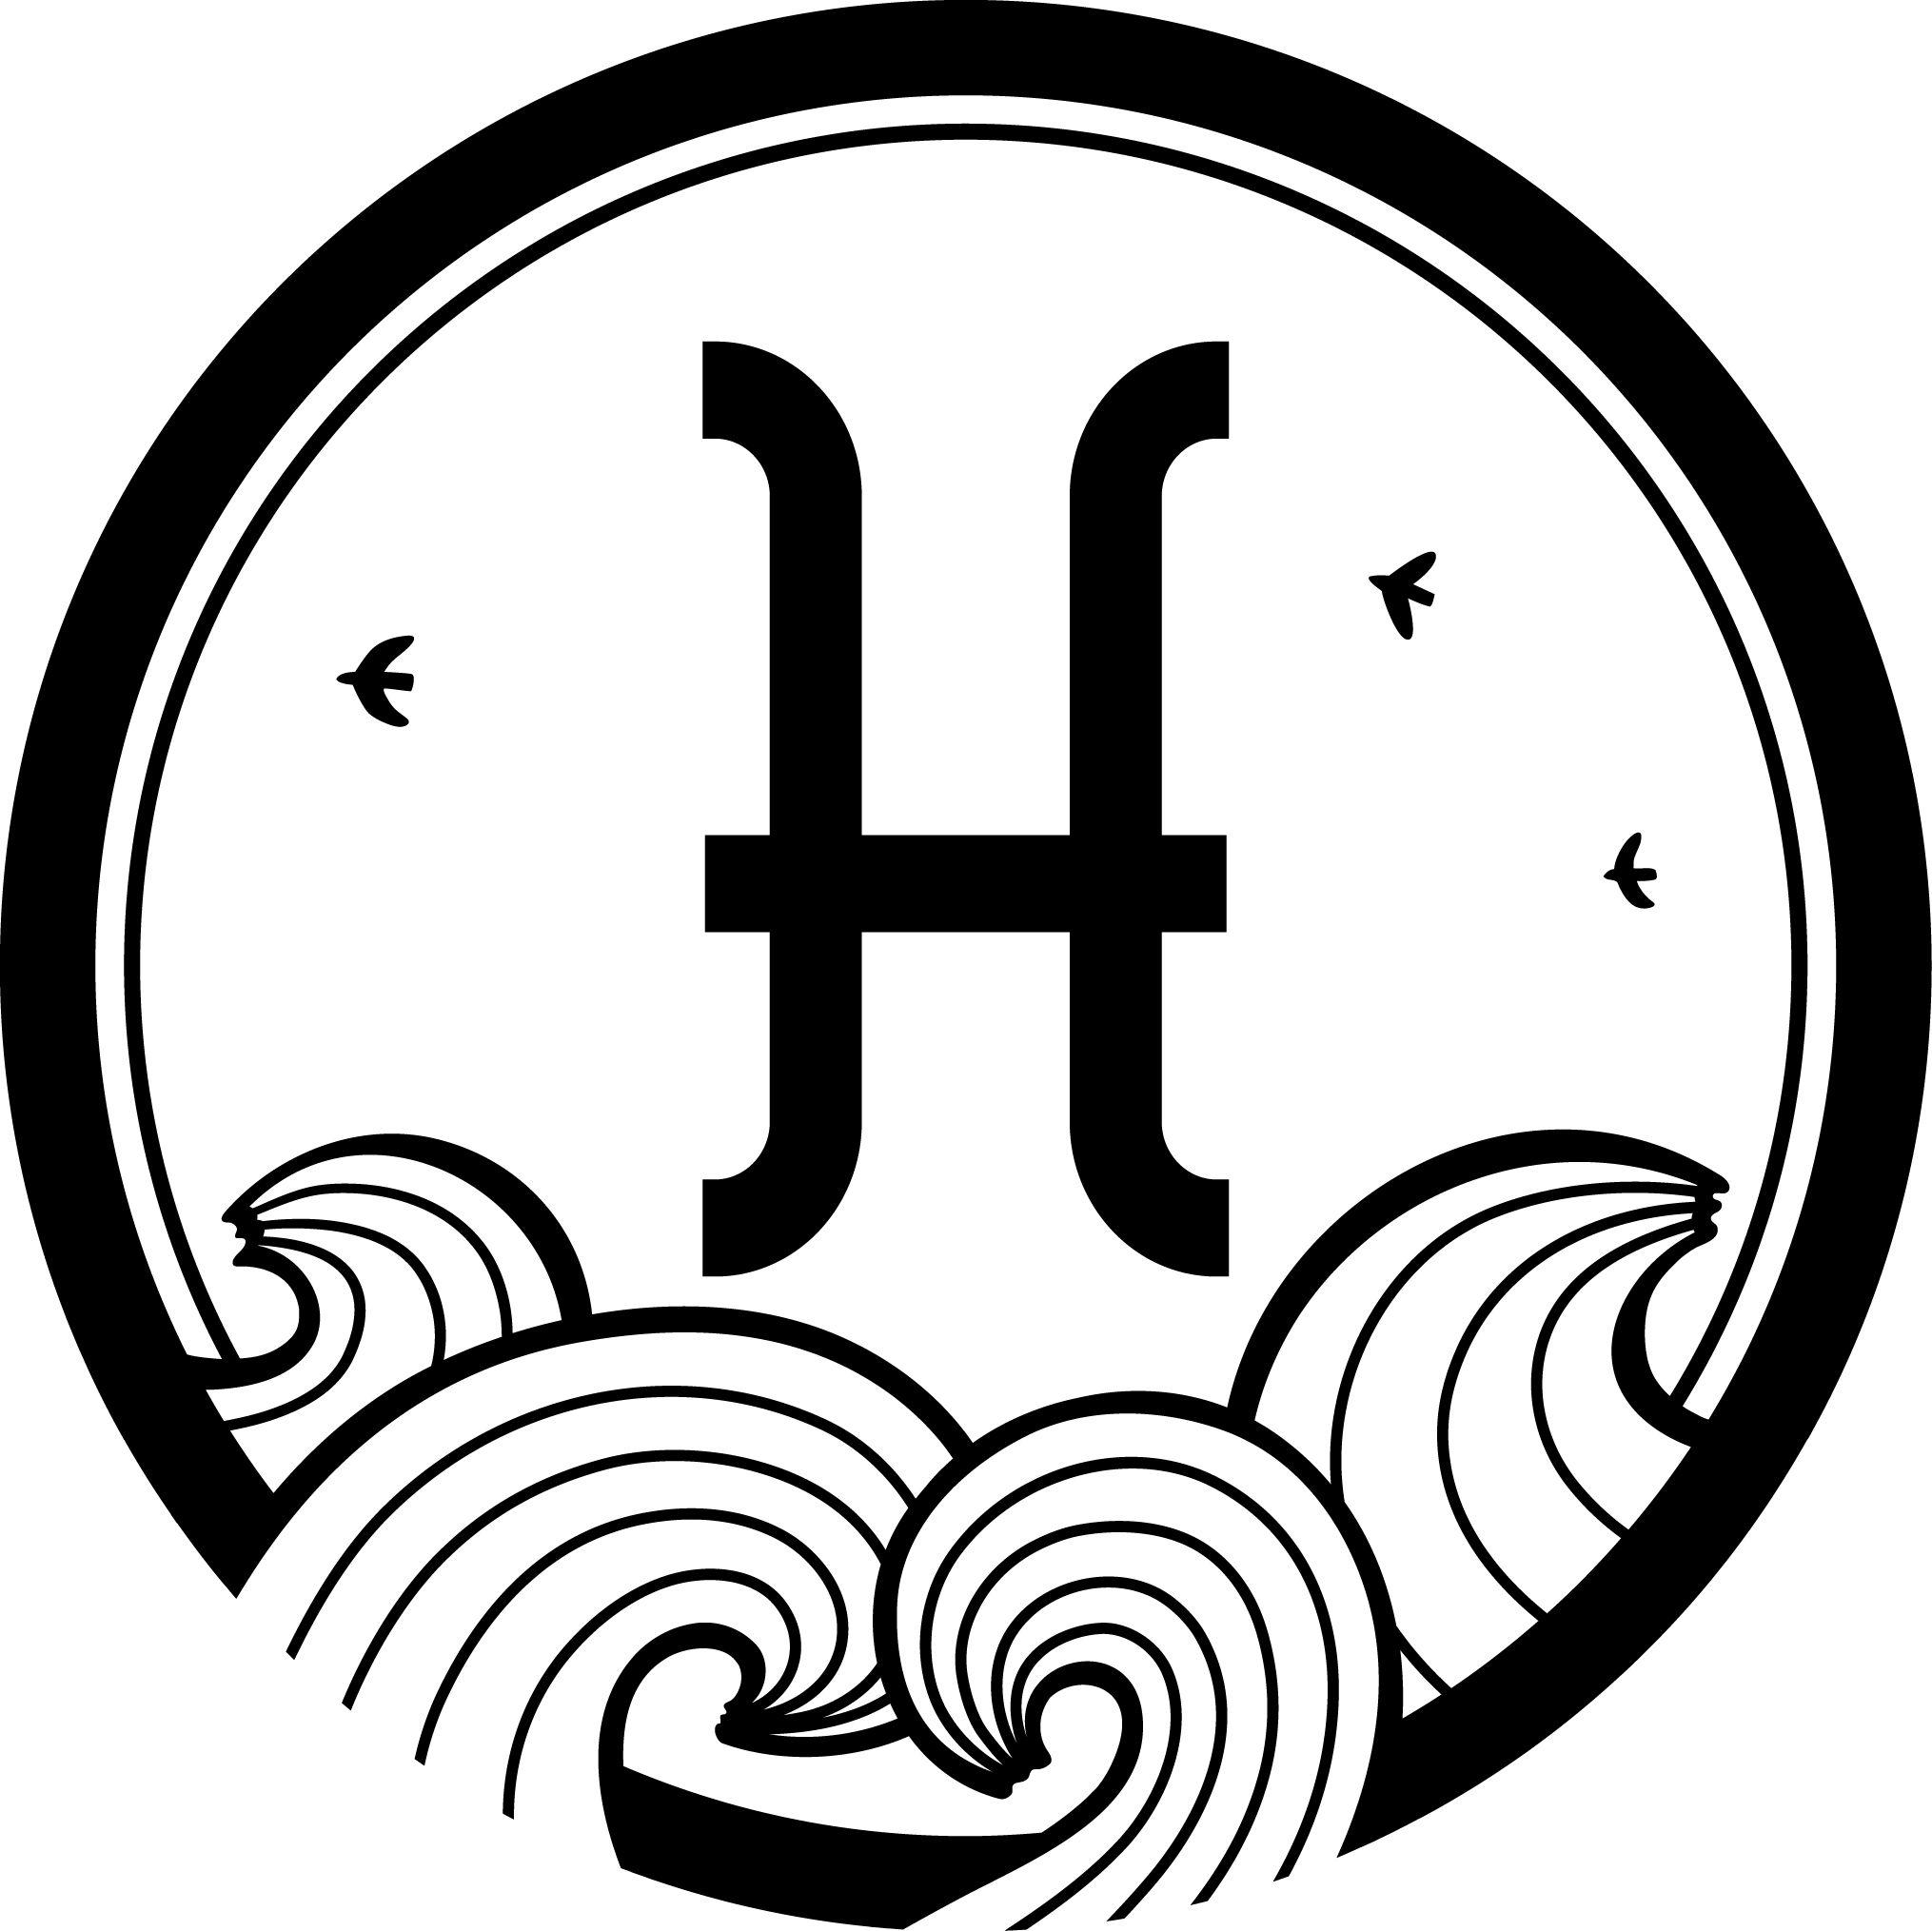 Beautiful Logo For Chocolate Maker Hogarth Craft Chocolate